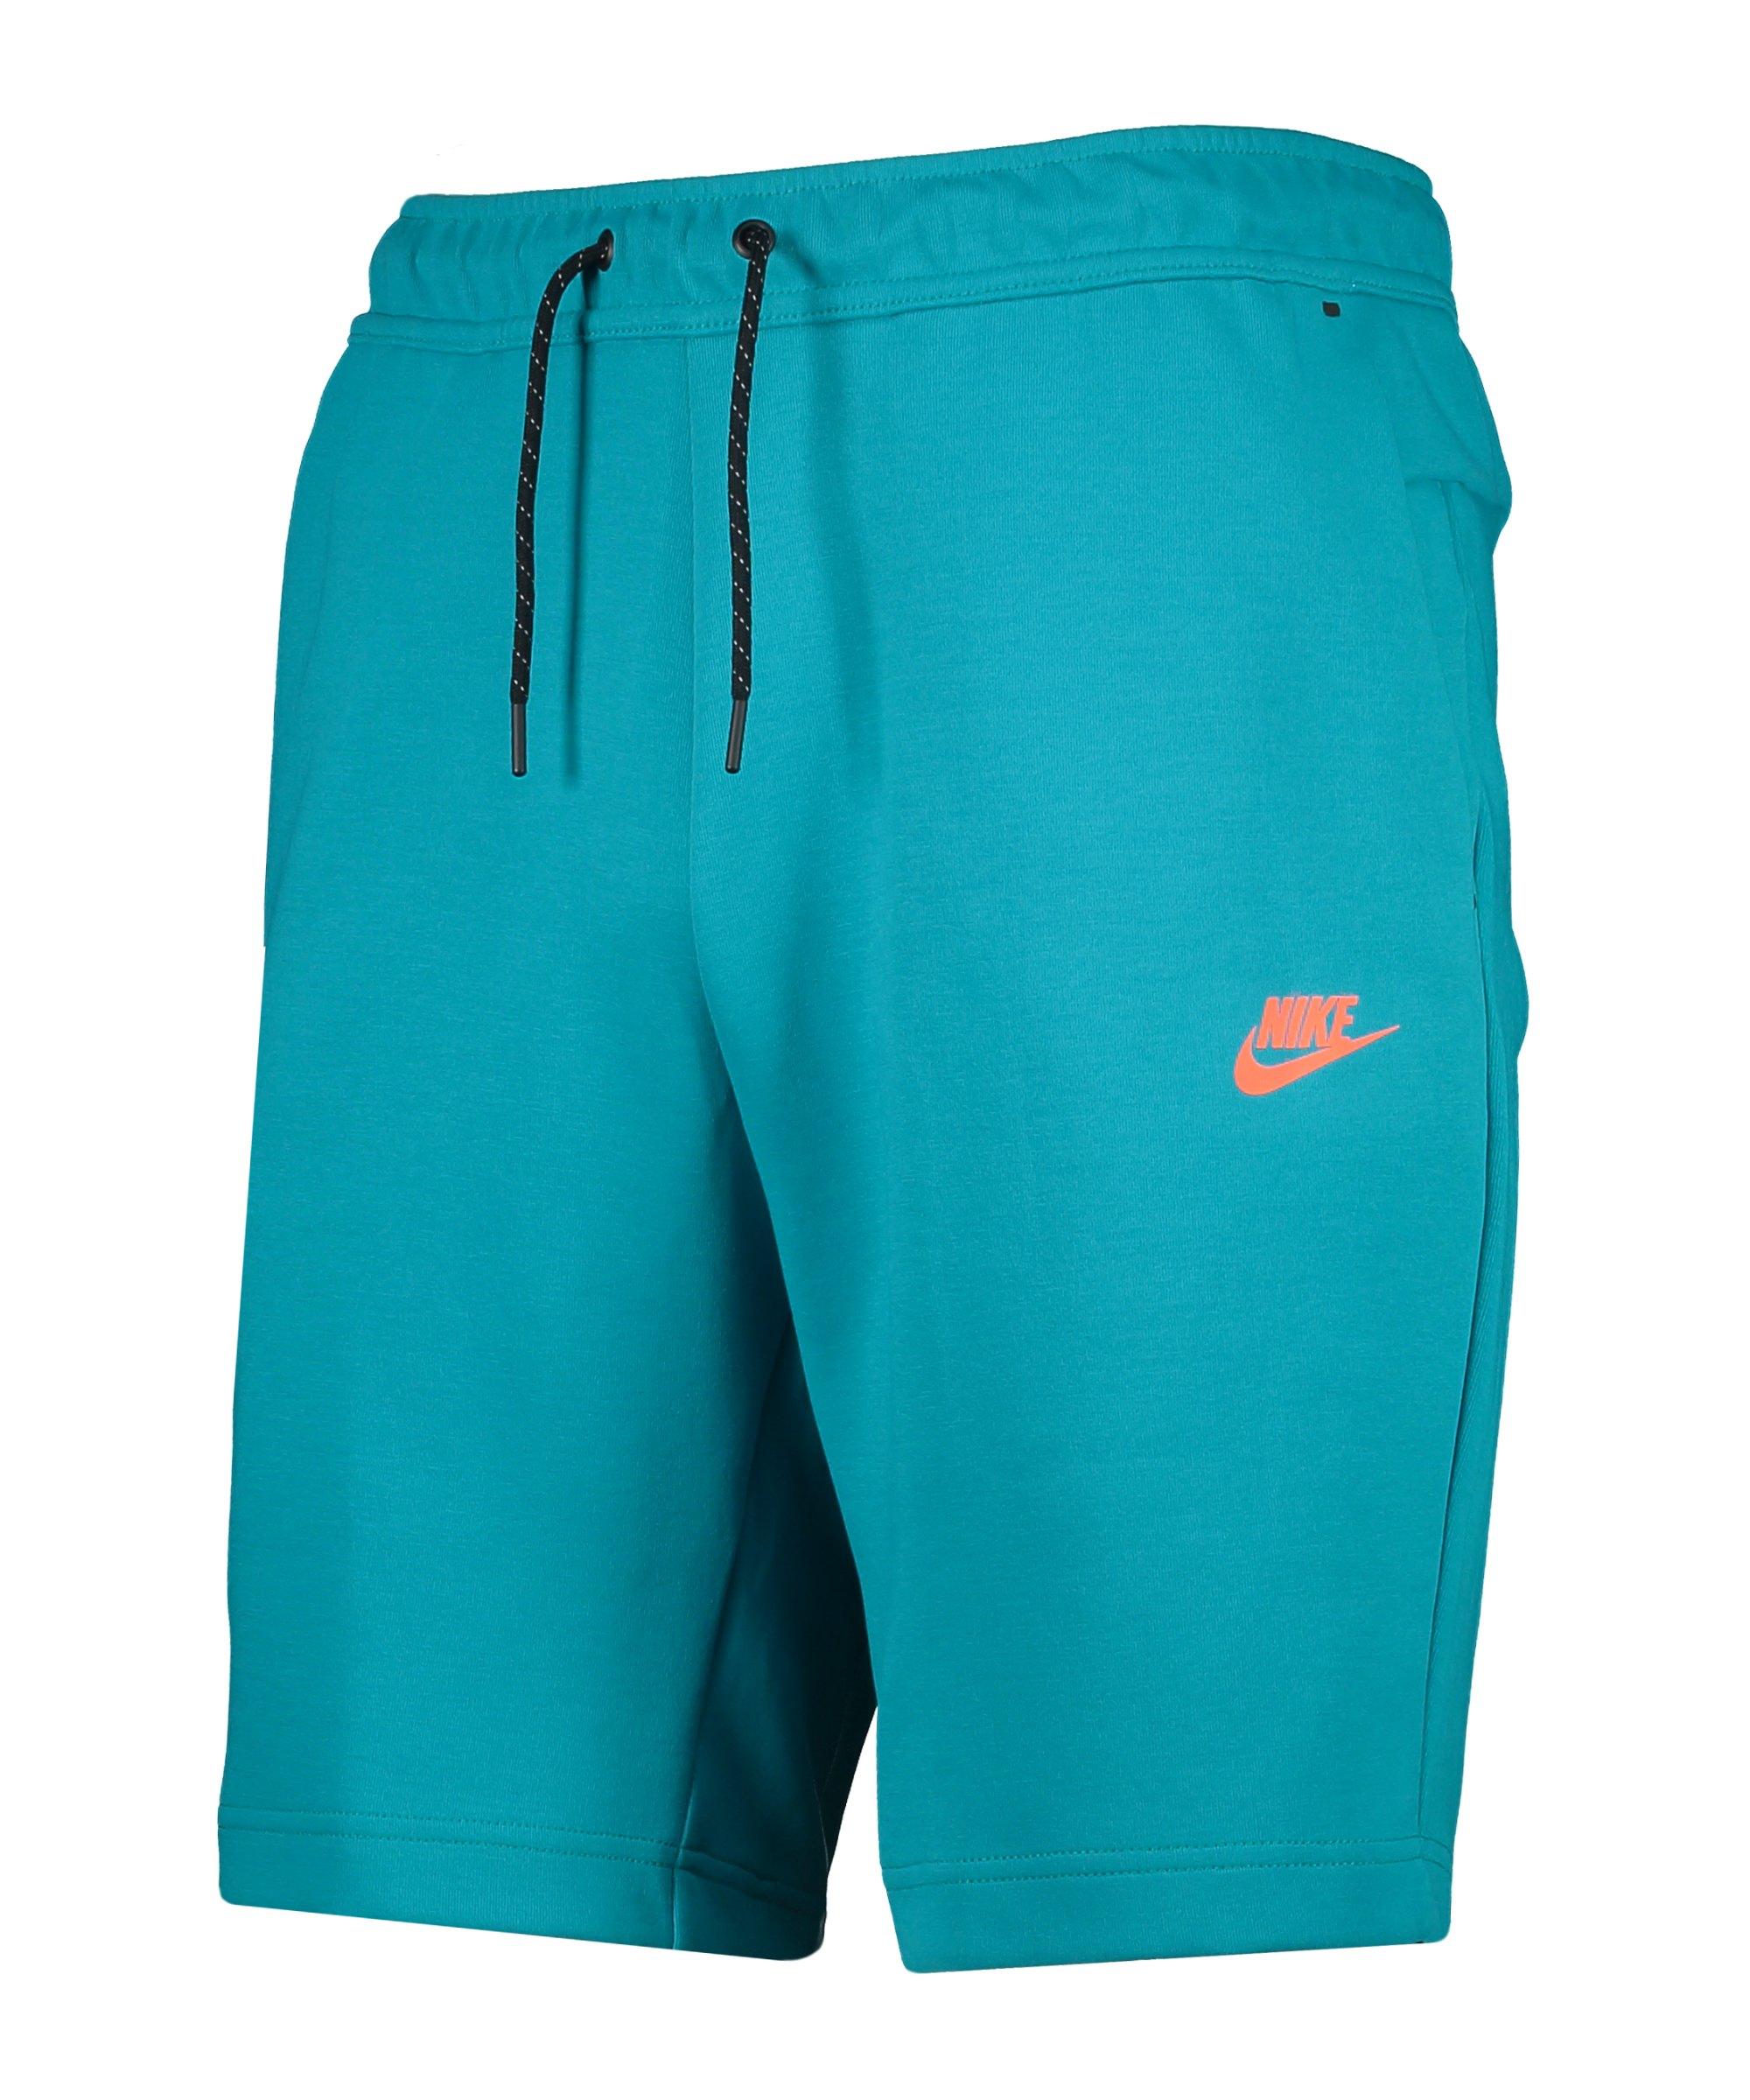 Nike Tech Fleece Short Blau Orange F356 - tuerkis